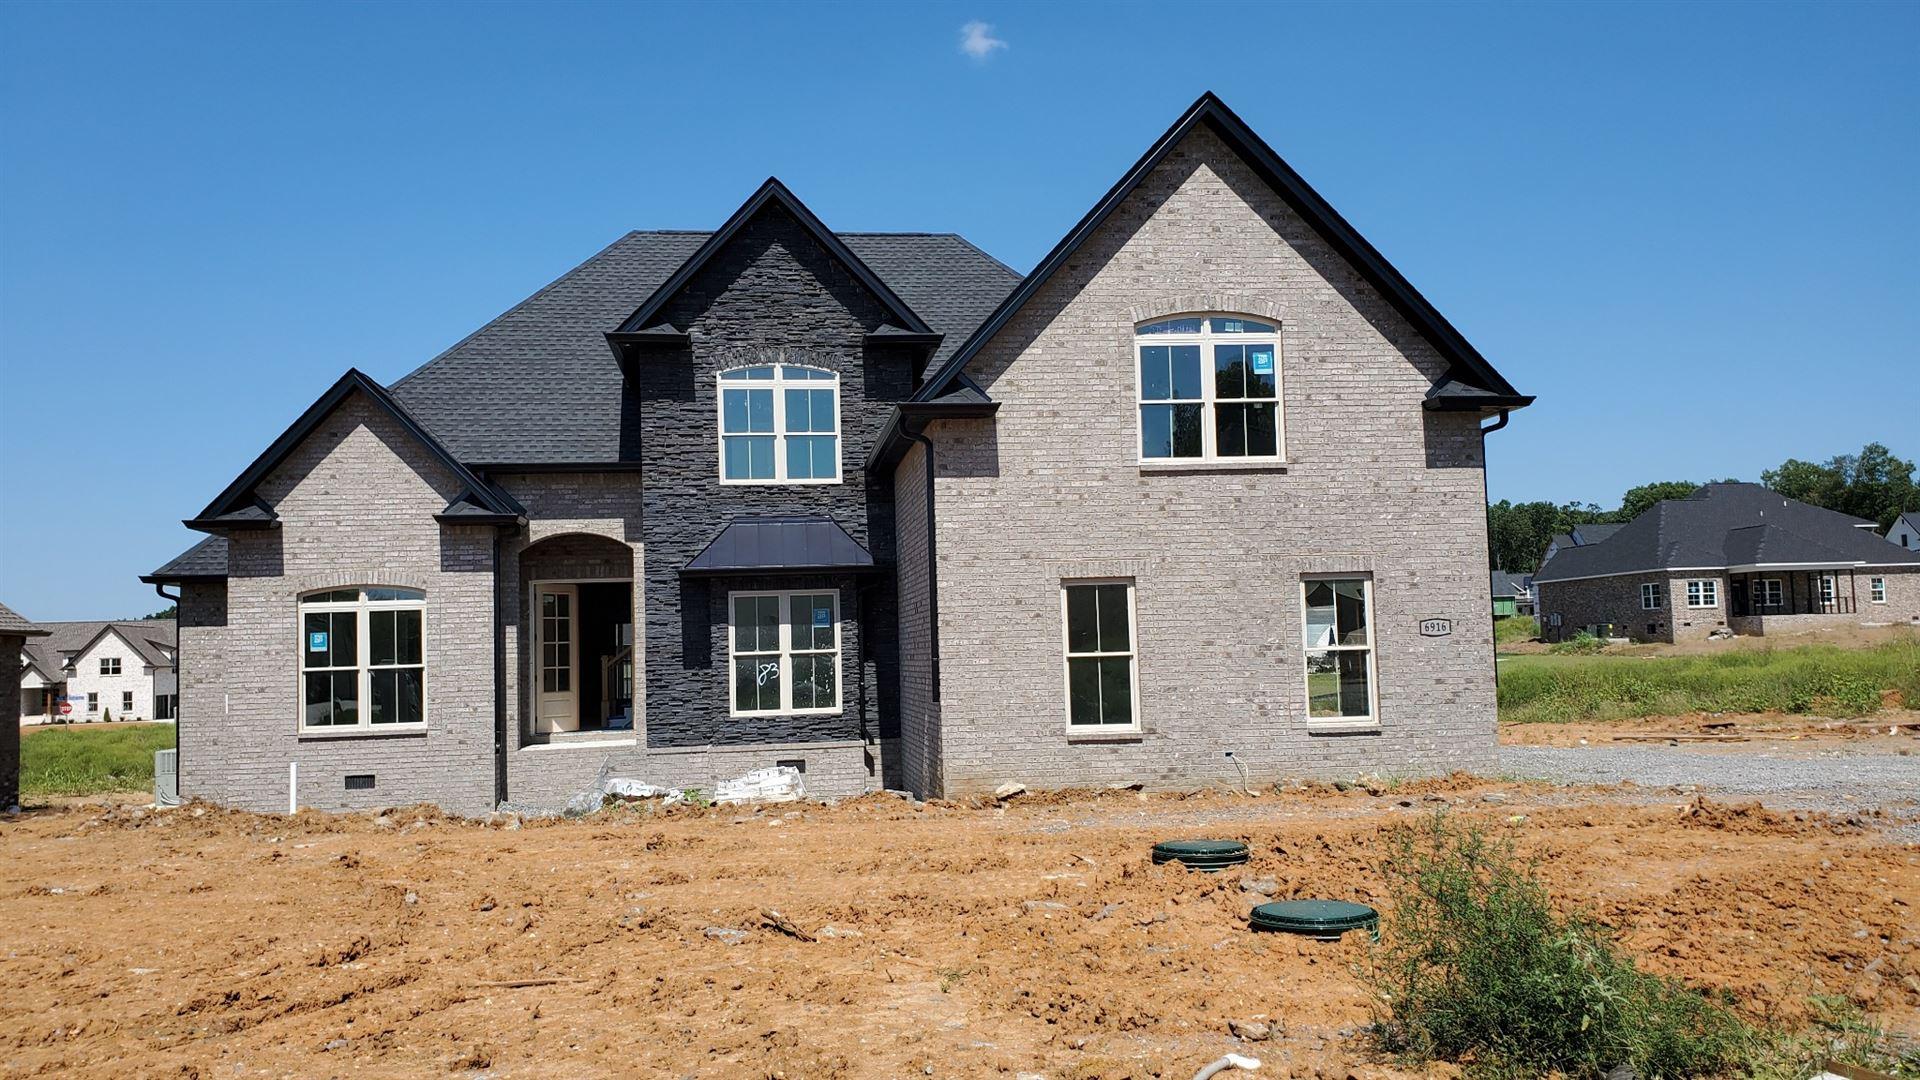 6916 Hiatus Ct, Murfreesboro, TN 37129 - MLS#: 2286962